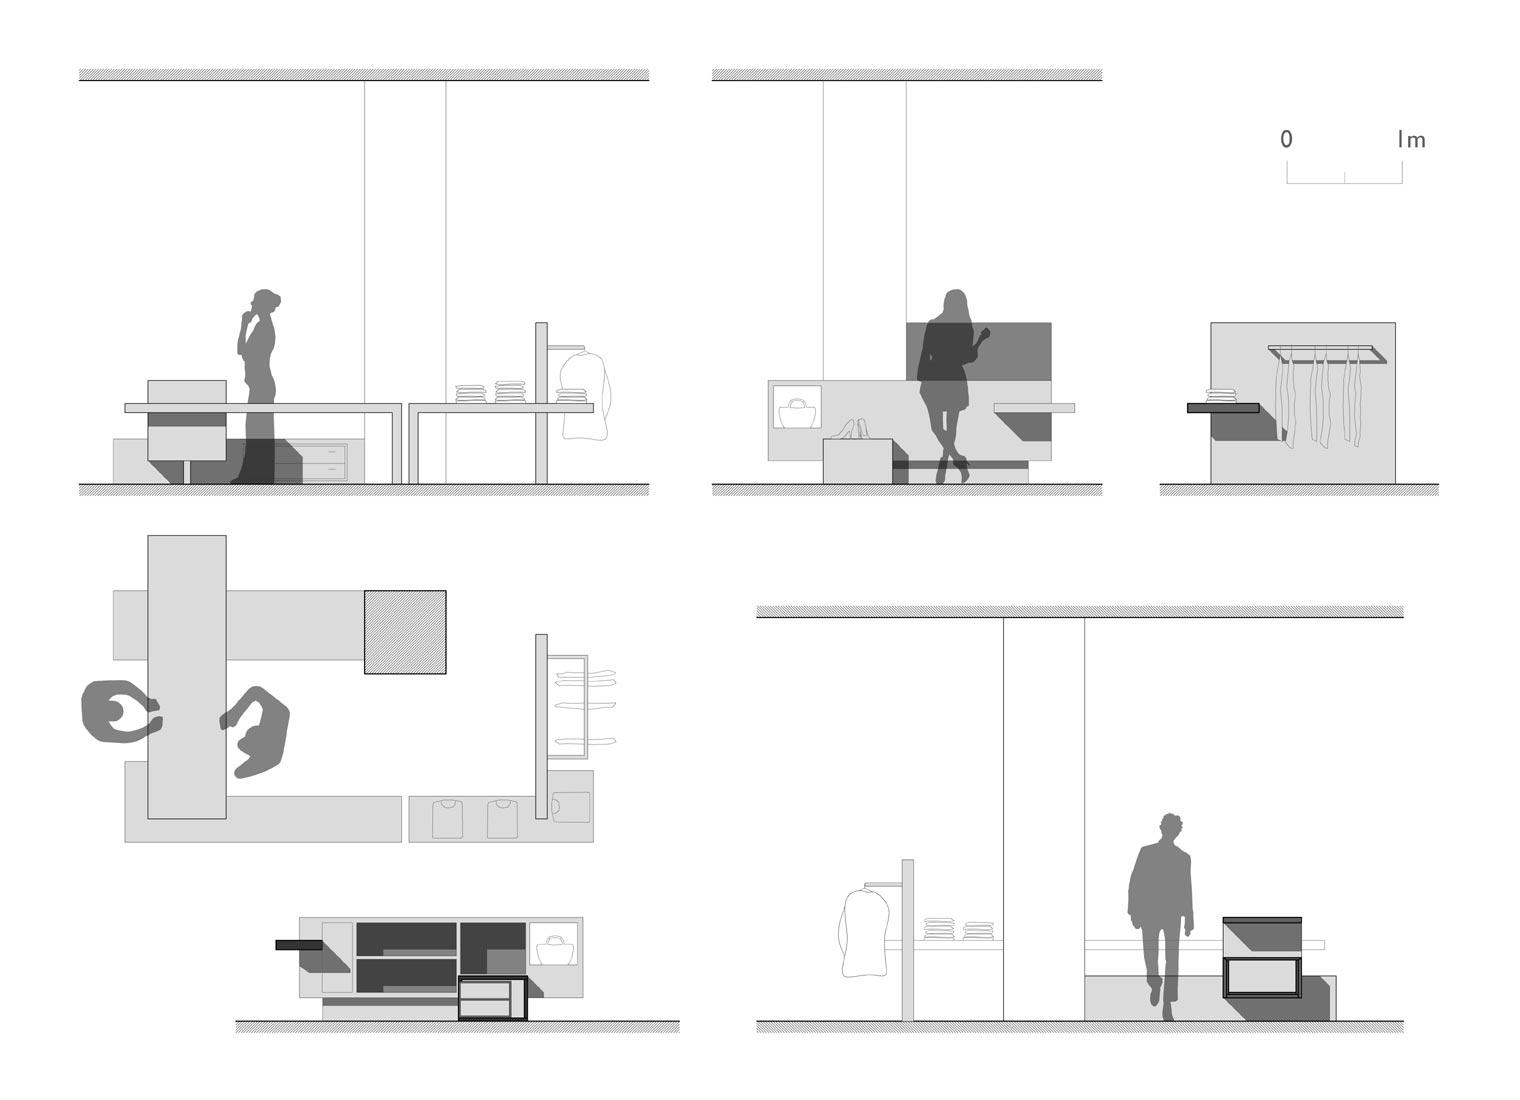 vk-architetti_godina_plan